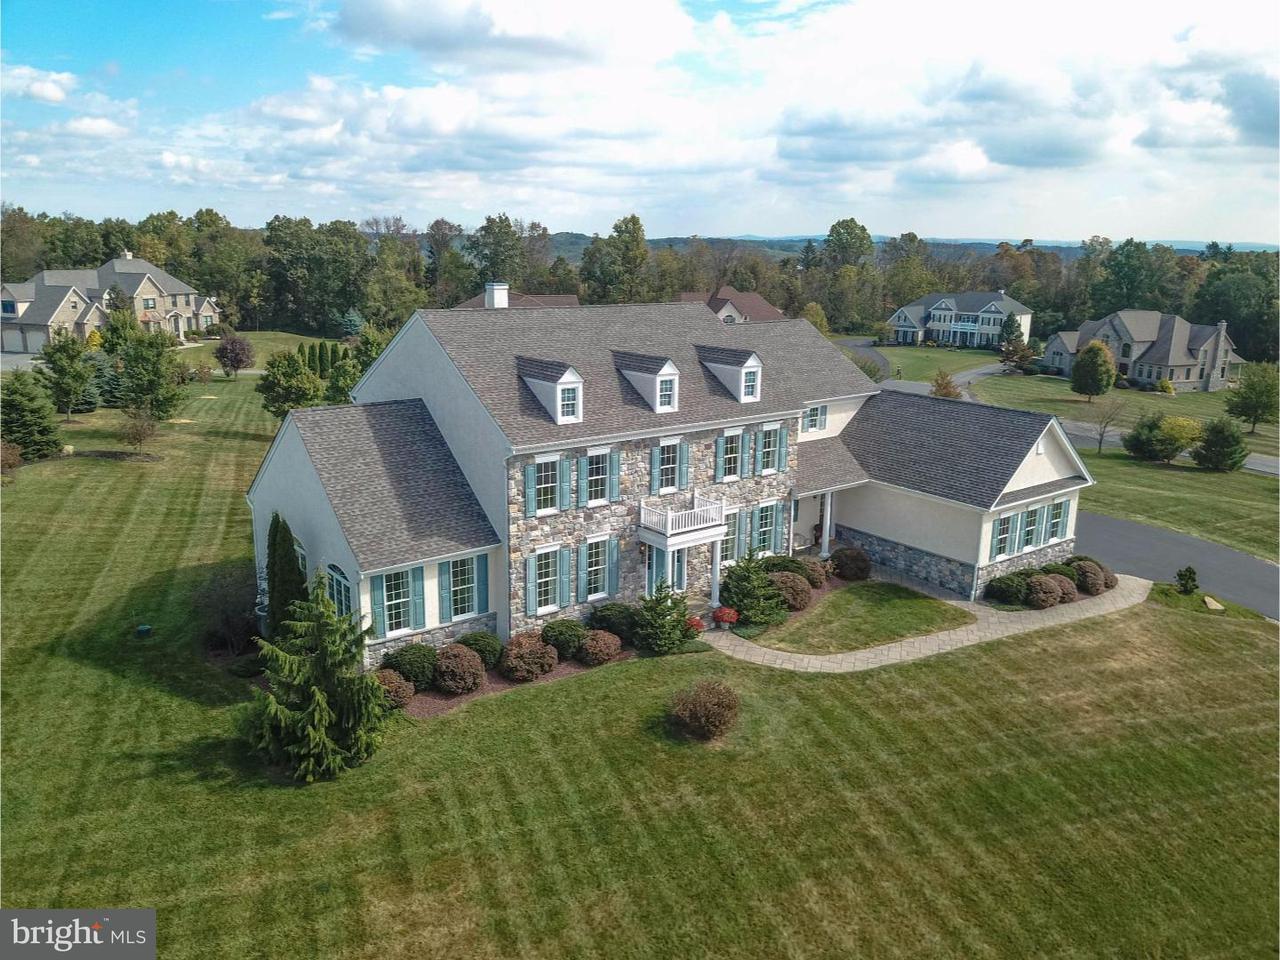 Single Family Home for Sale at 312 SHAUNA WAY Nazareth, Pennsylvania 18064 United States